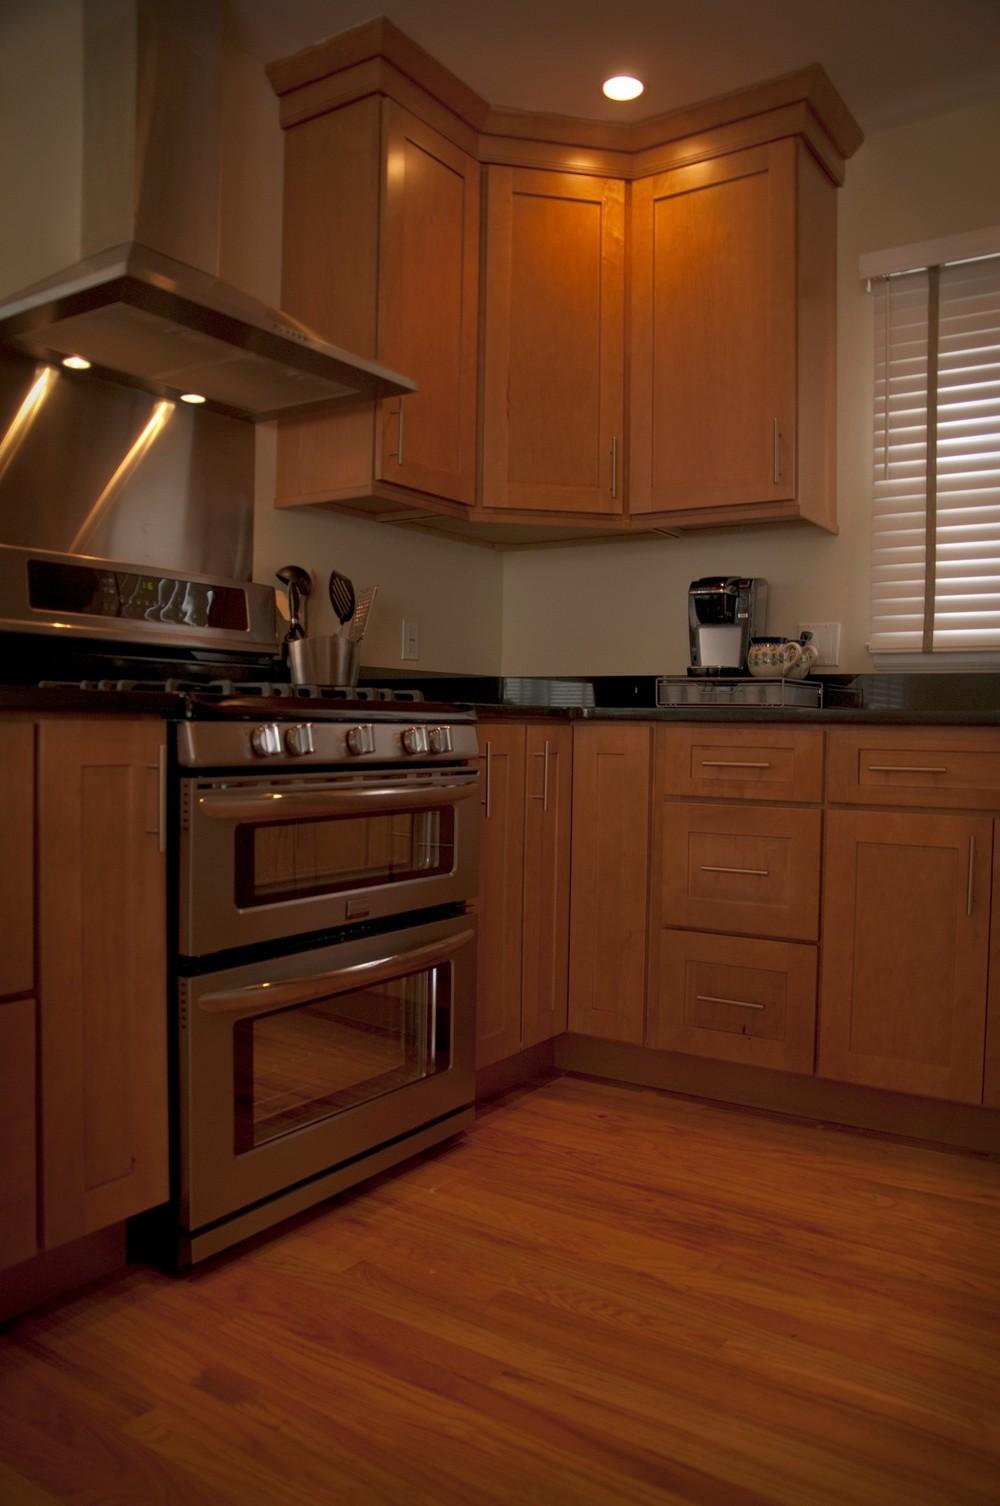 kitchen oven.jpg